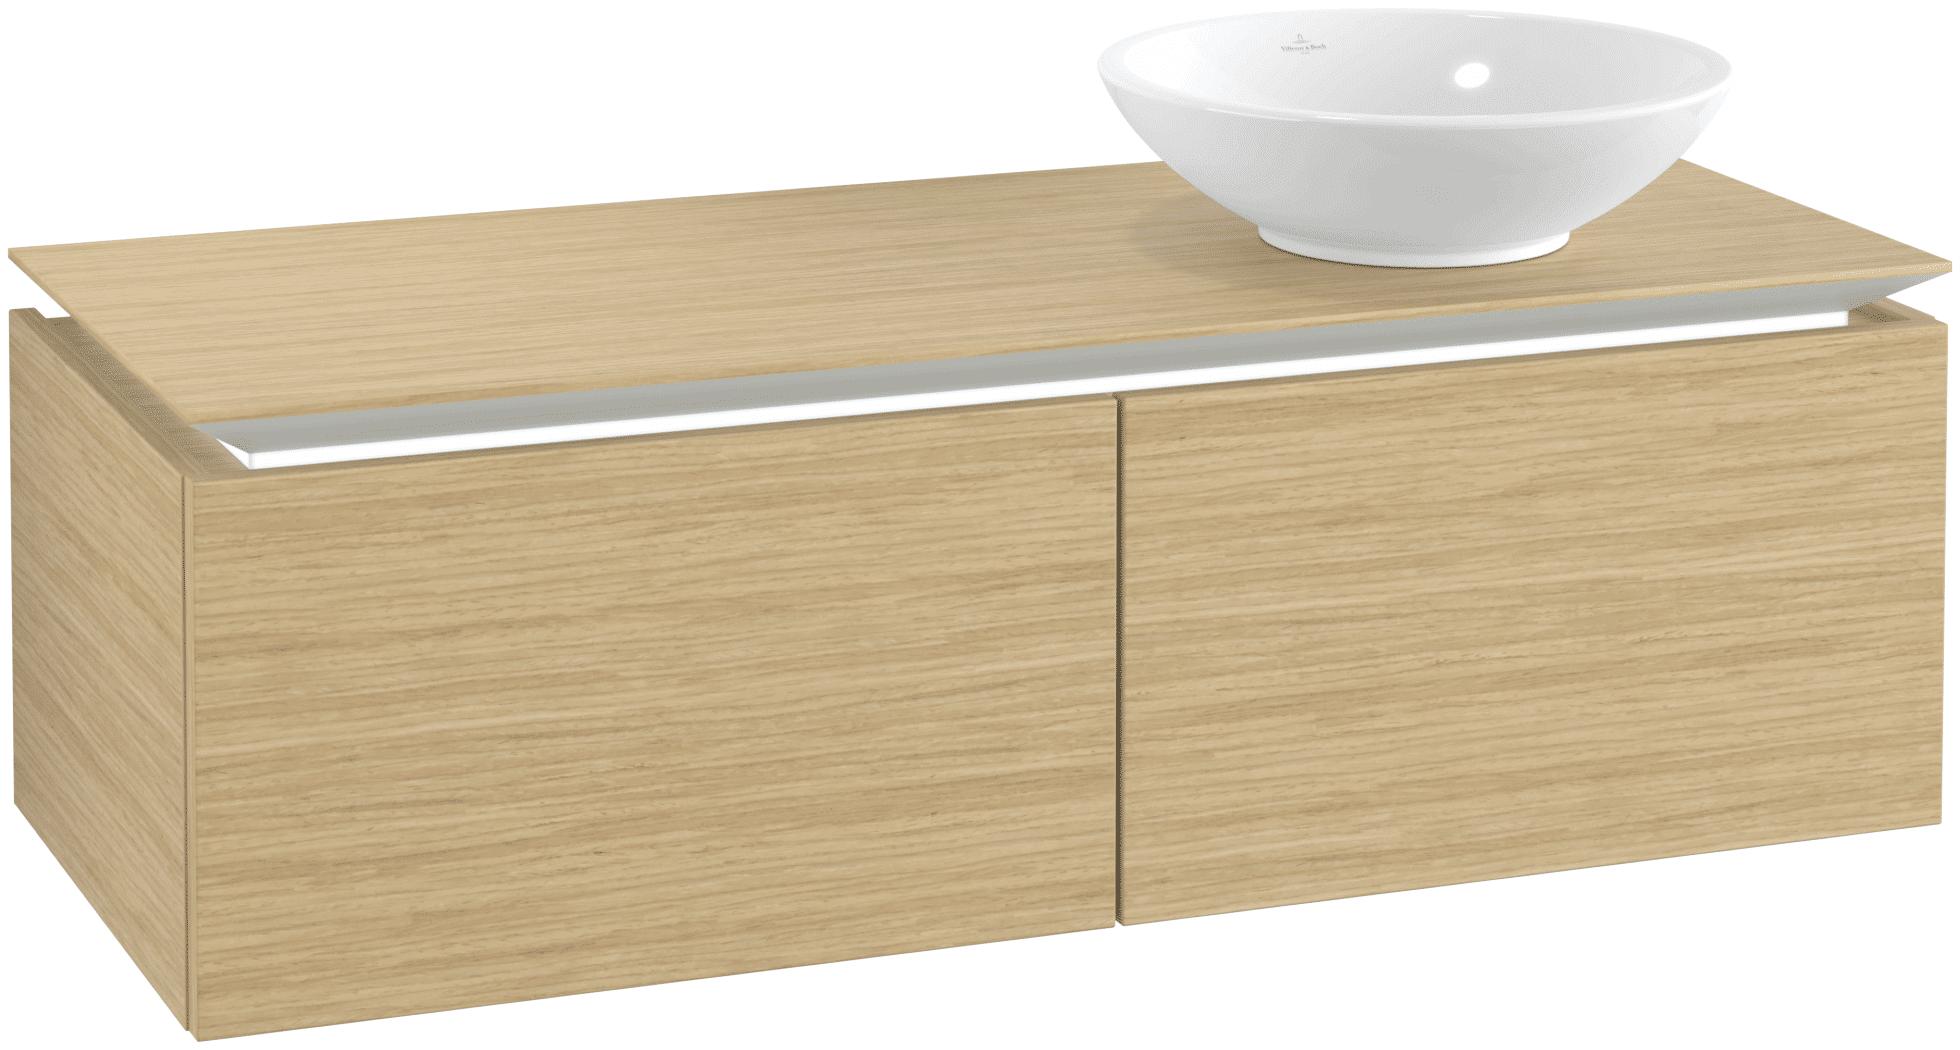 Villeroy & Boch Villeroy & Boch Legato - Meuble sous lavabo with 2 drawers & 1 cut-out right 1200 x 380 x 500mm nordic oak